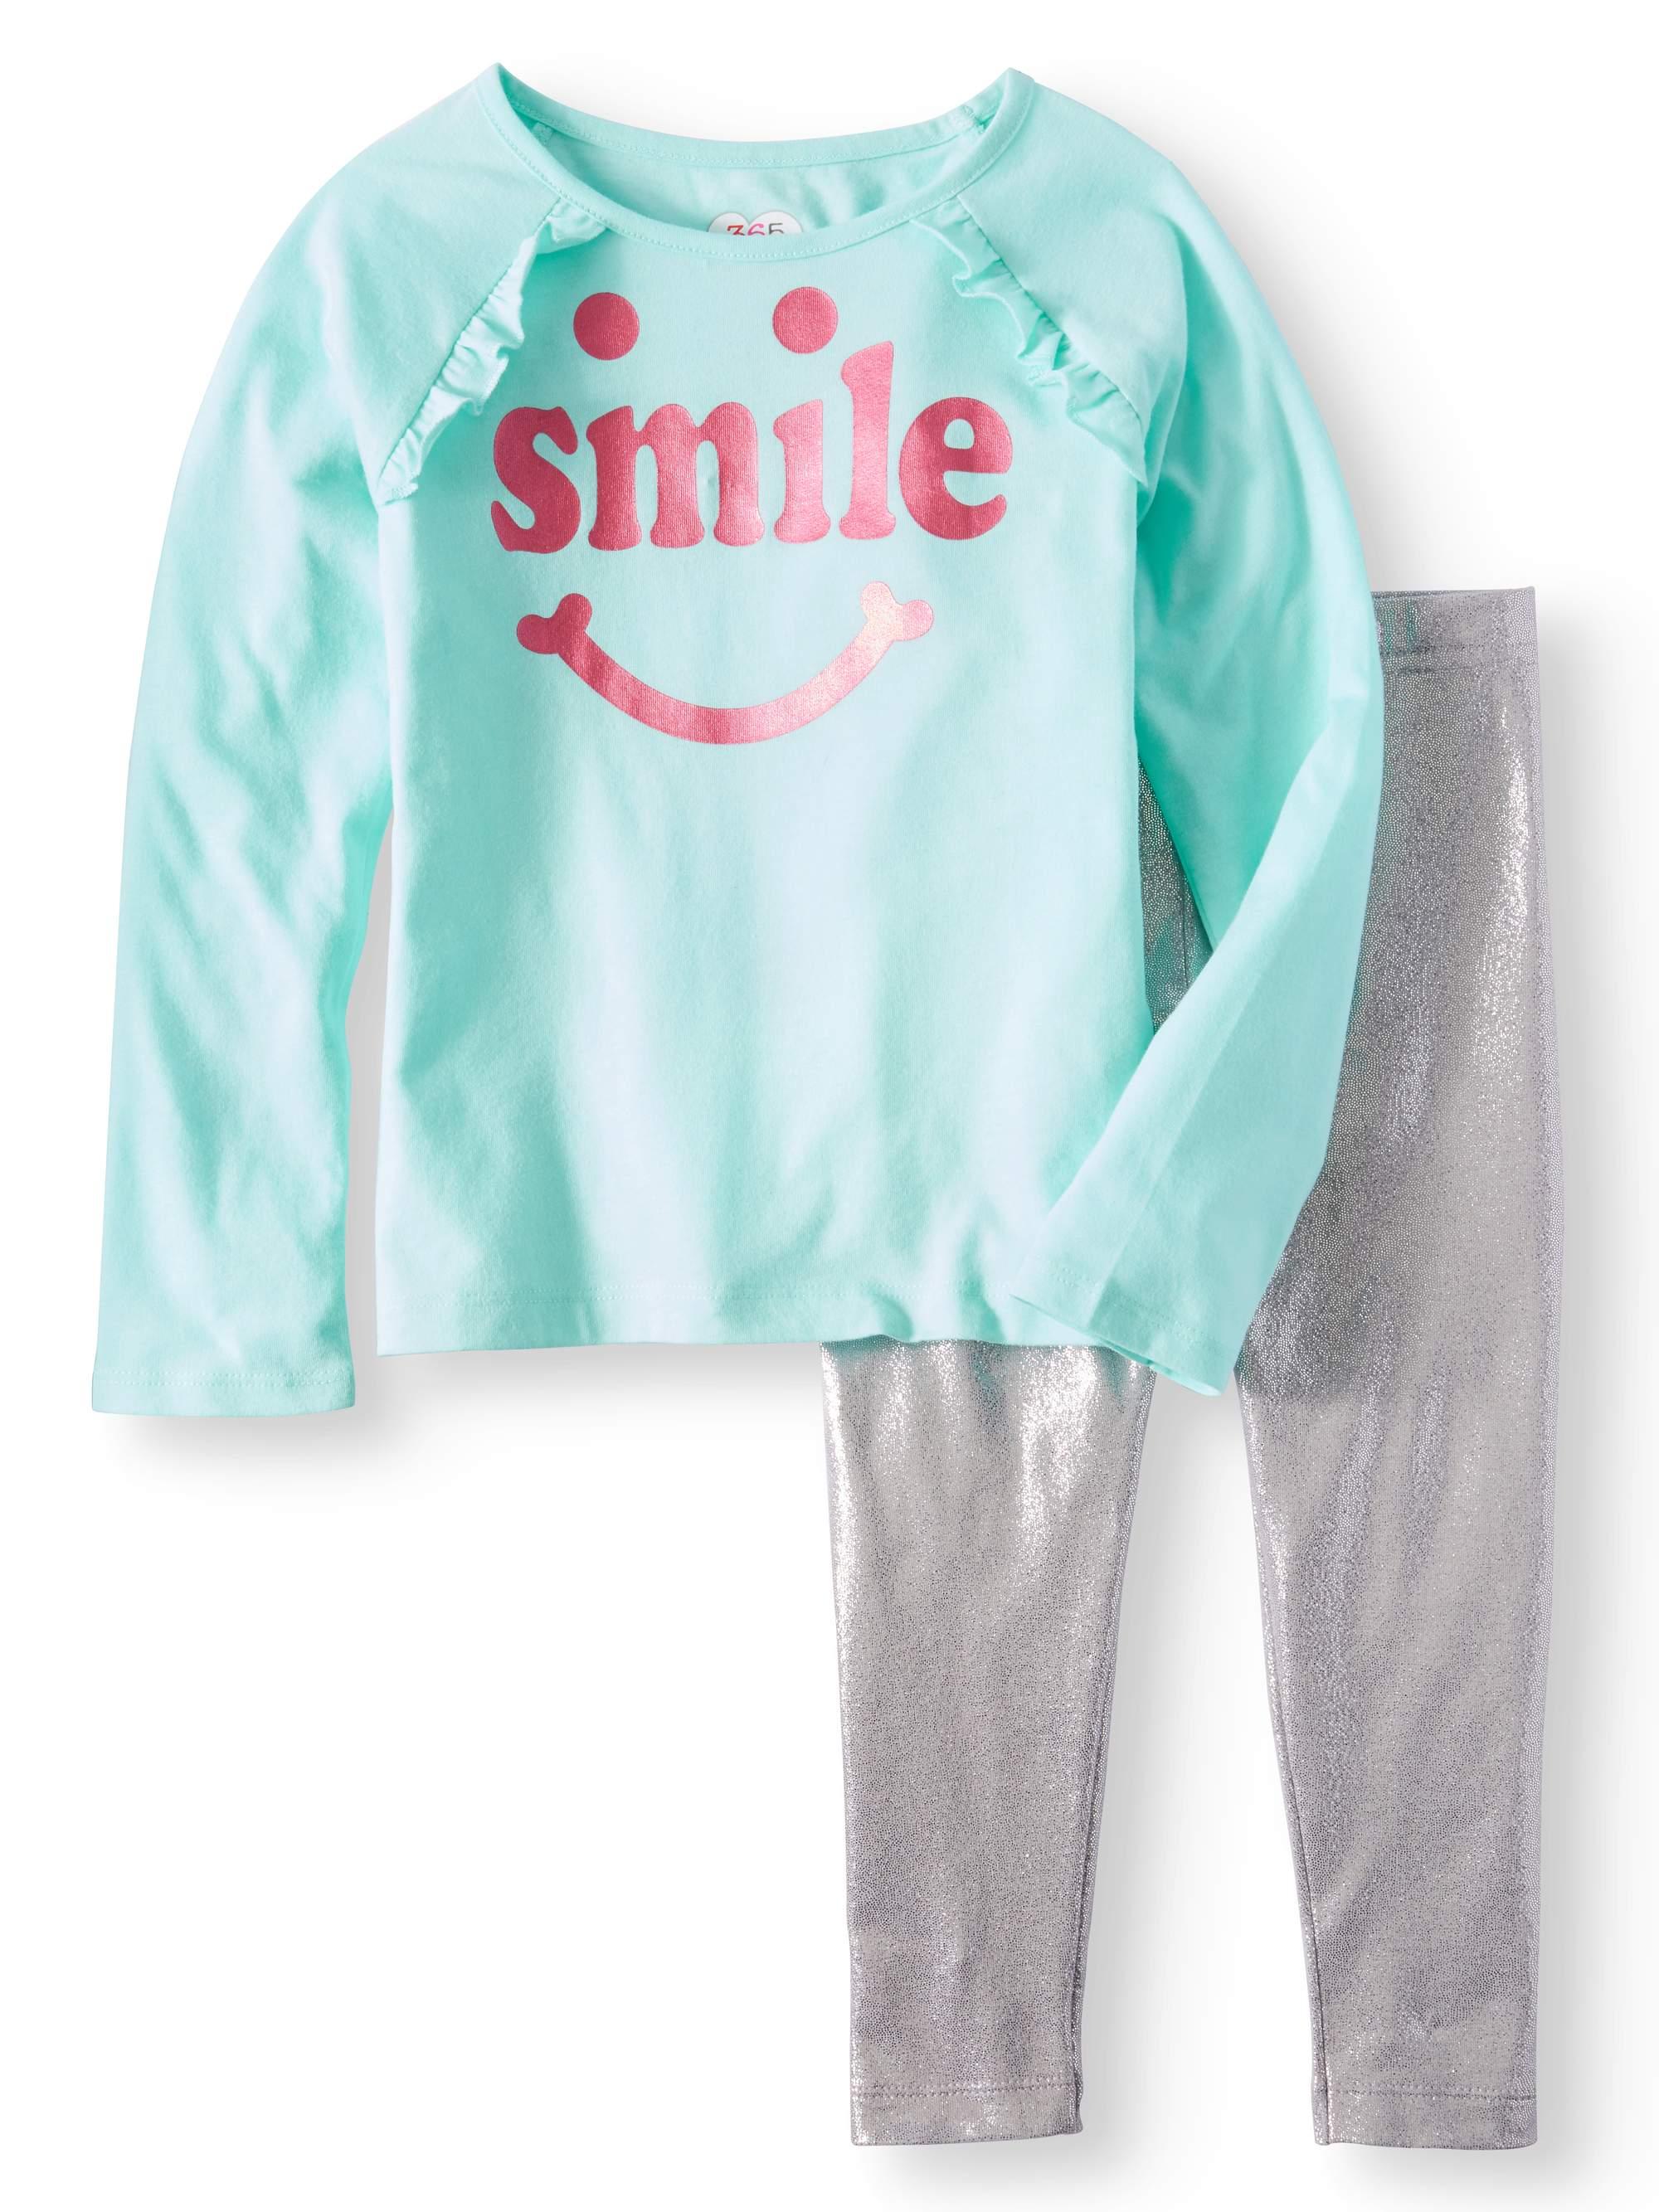 Girls' Long Sleeve Graphic Ruffle Raglan Tee & Shimmer Leggings, 2pc Outfit Set